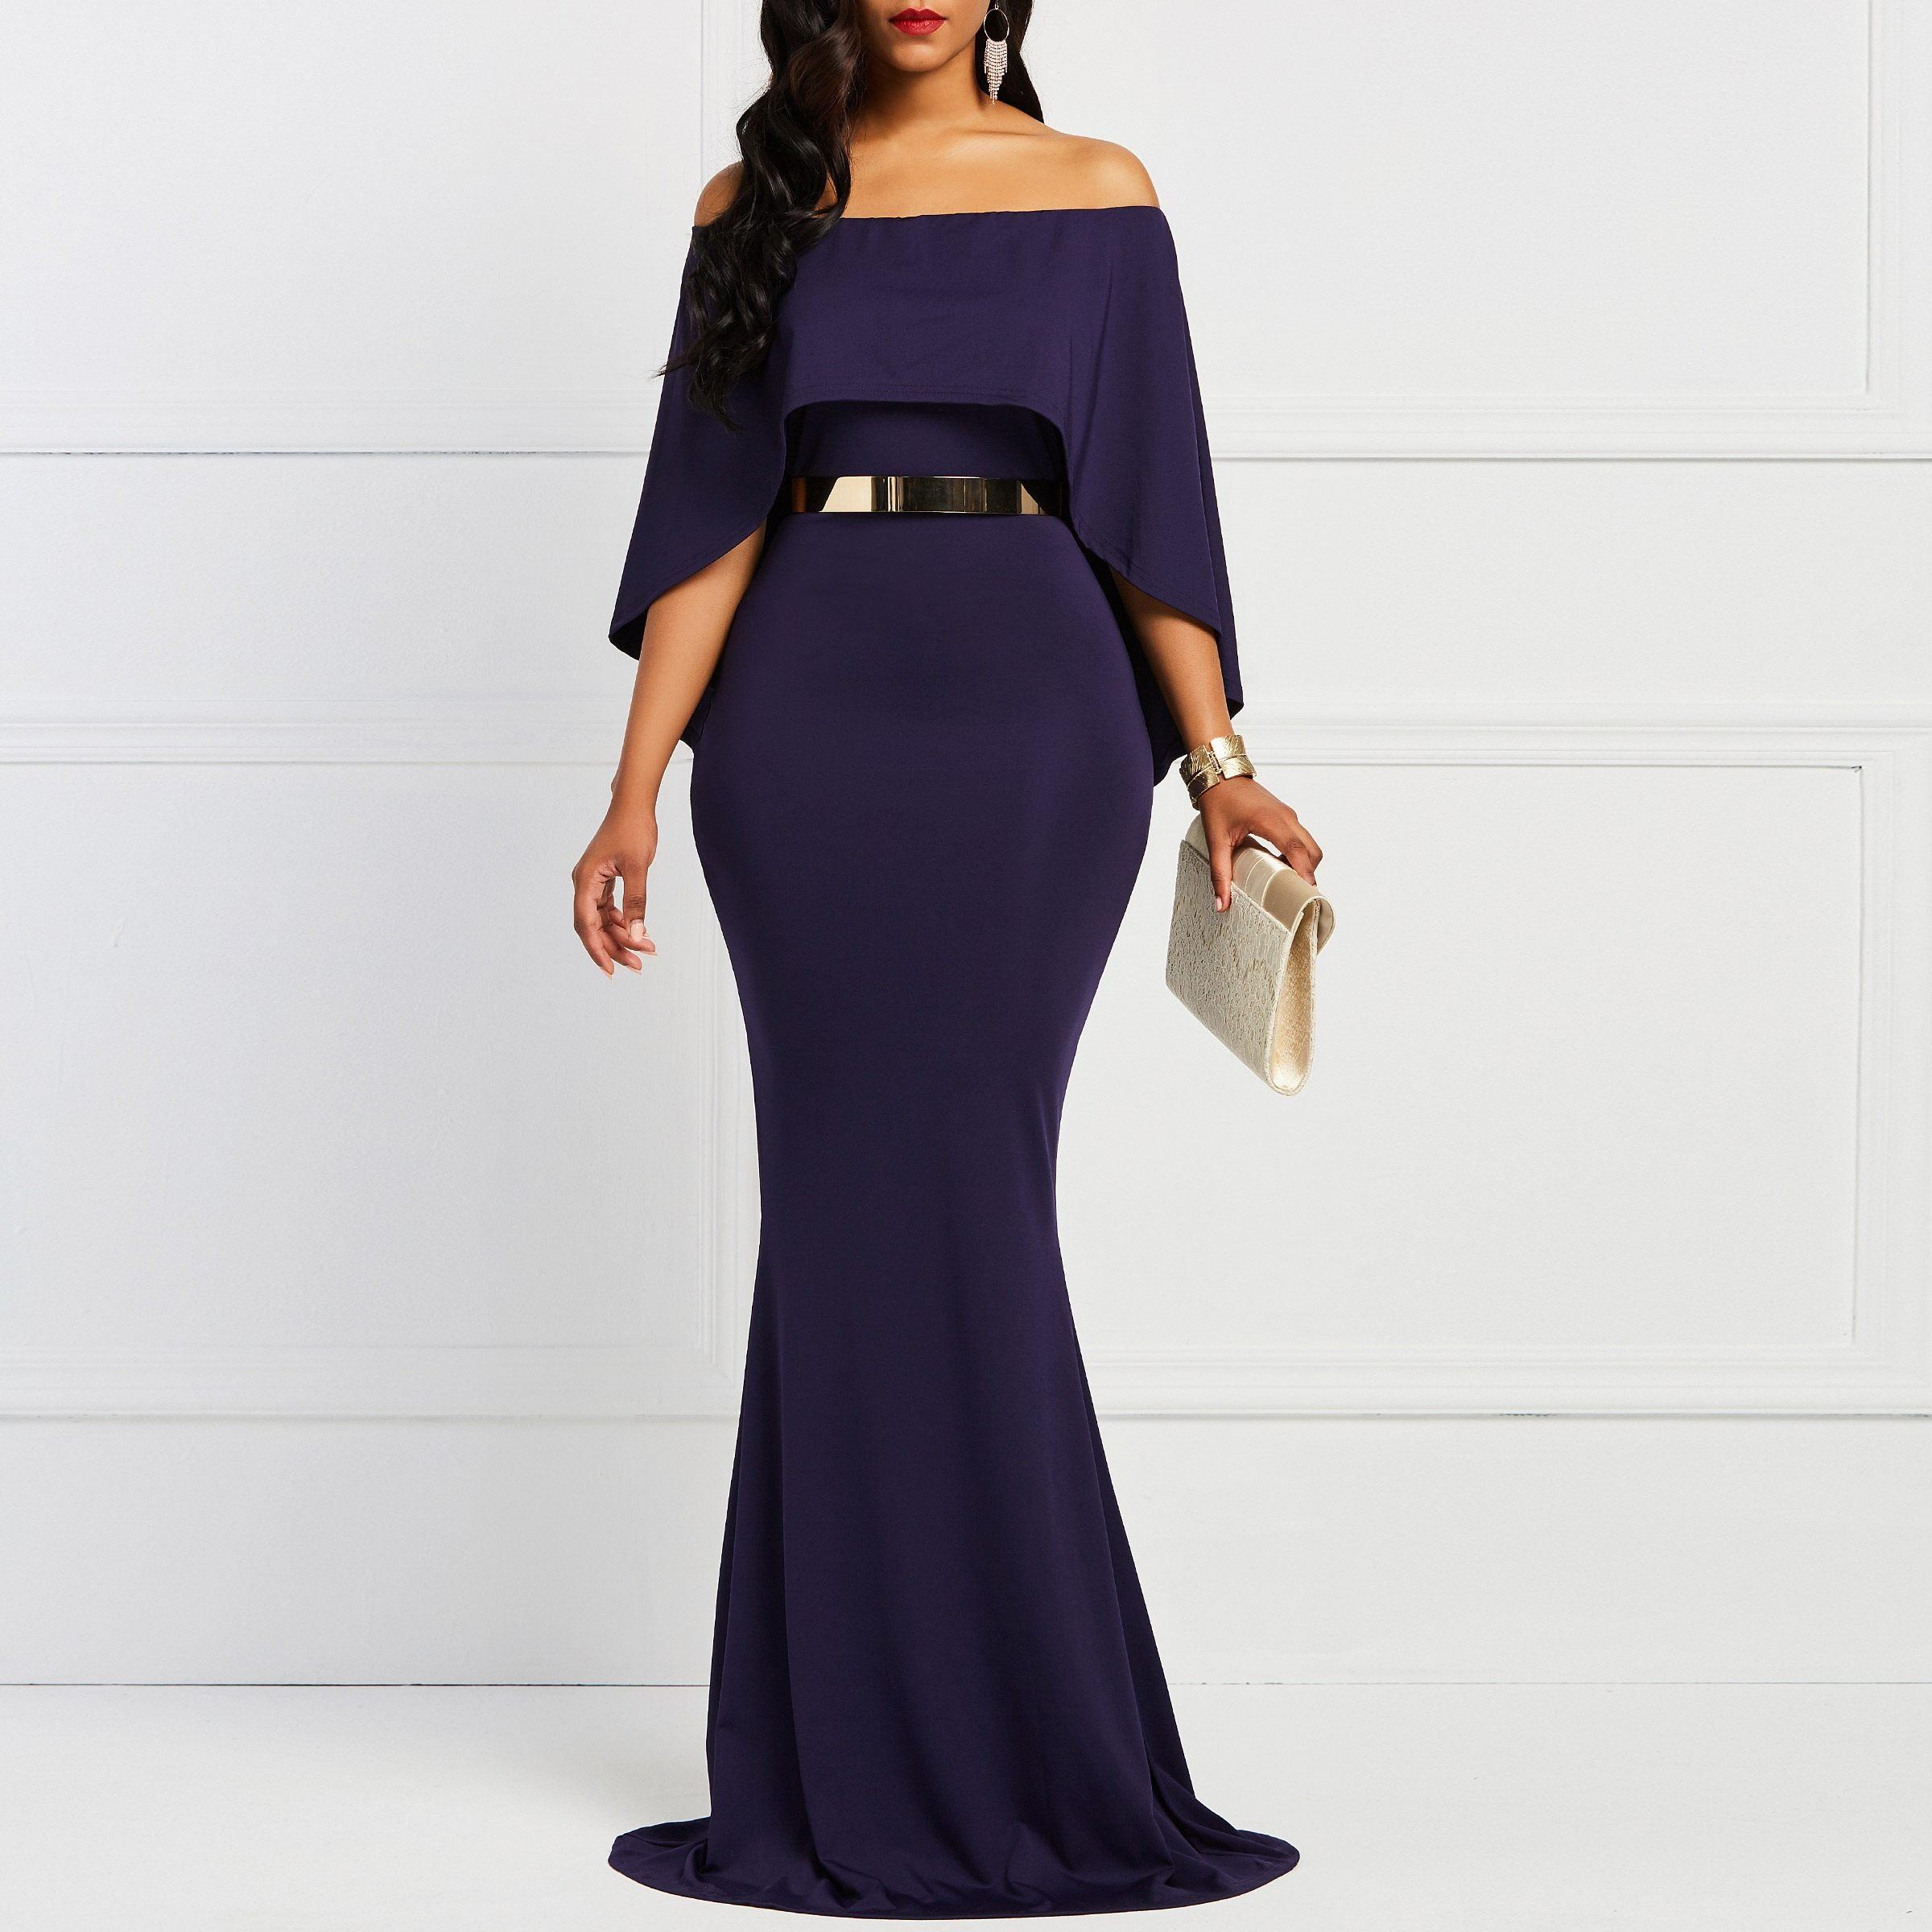 9982c633b33 Batwing Sleeve Bodycon Slash Neck Women s Dress Navy Elegany Trumpet  Evening Party Christmas Dinner Floor-